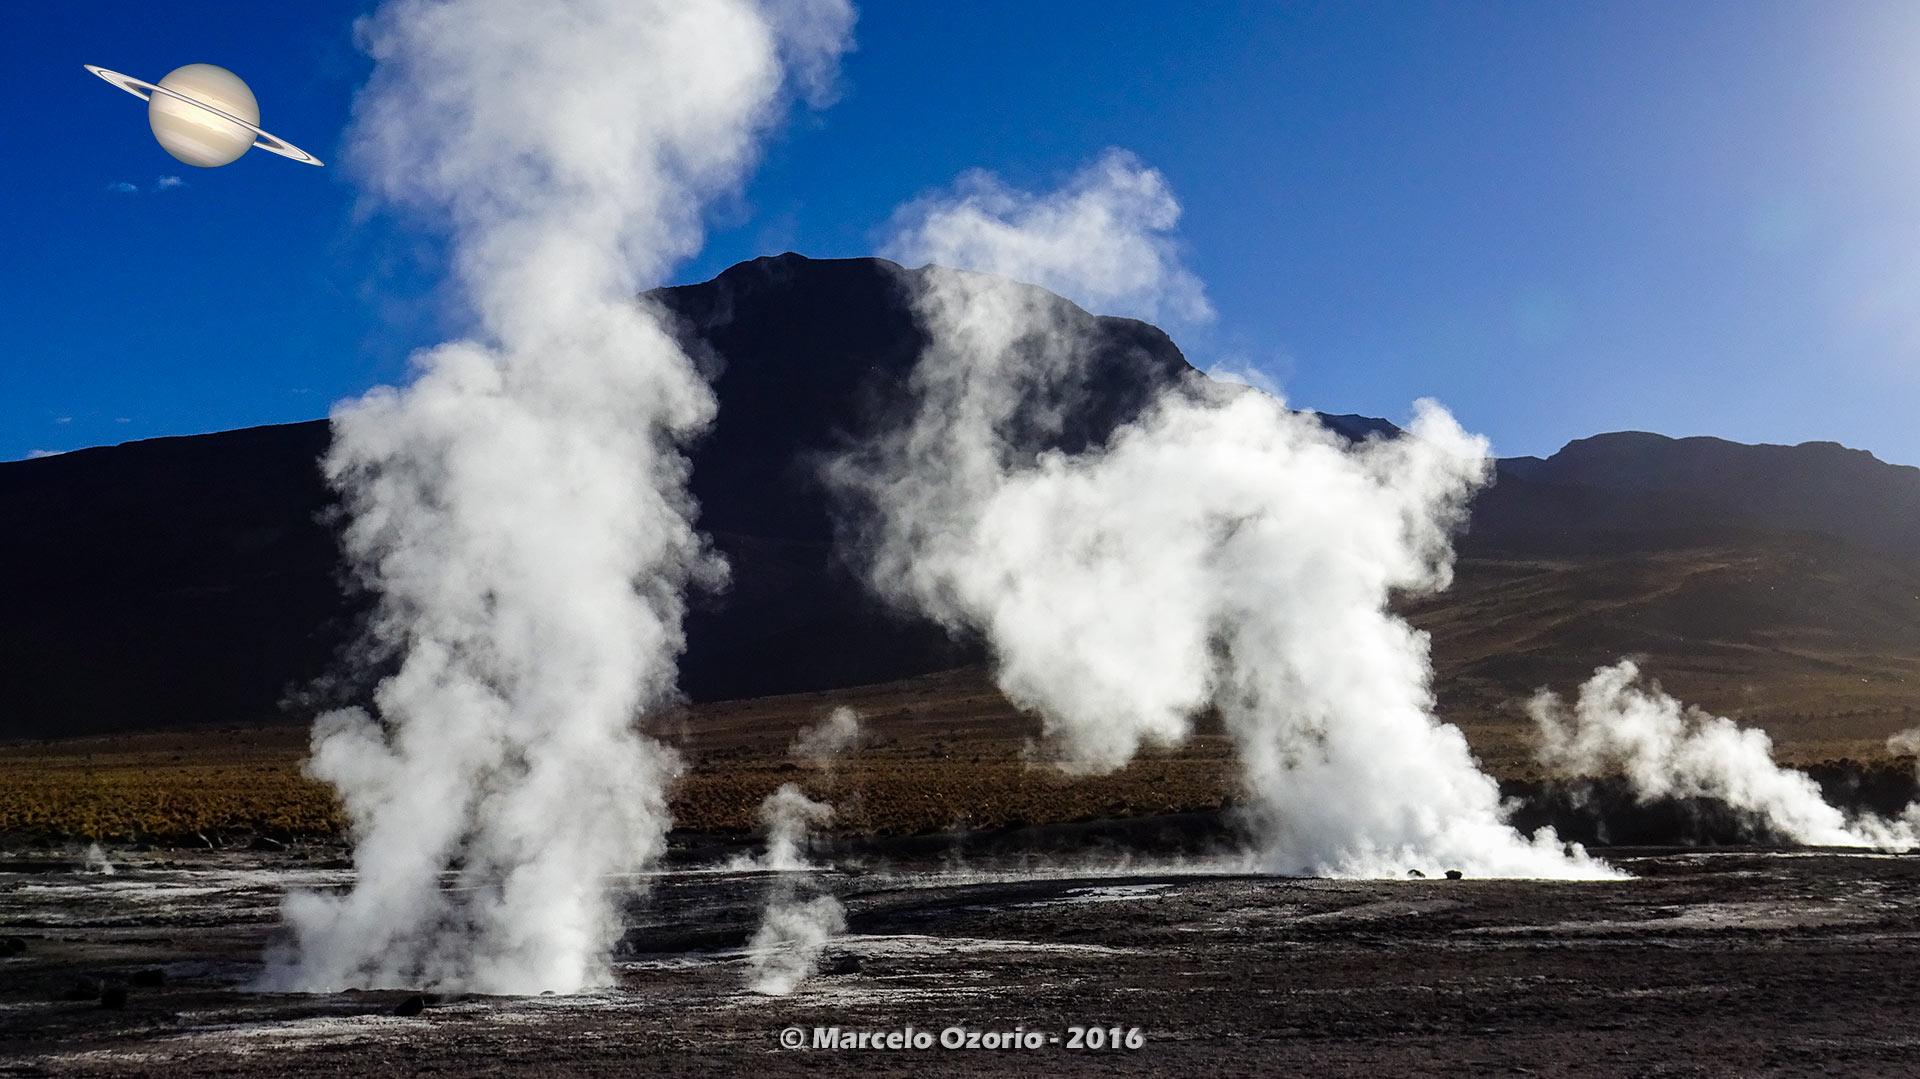 el tatio geysers atacama desert 25 - Os Surreais Gêiseres El Tatio - Deserto do Atacama - Chile